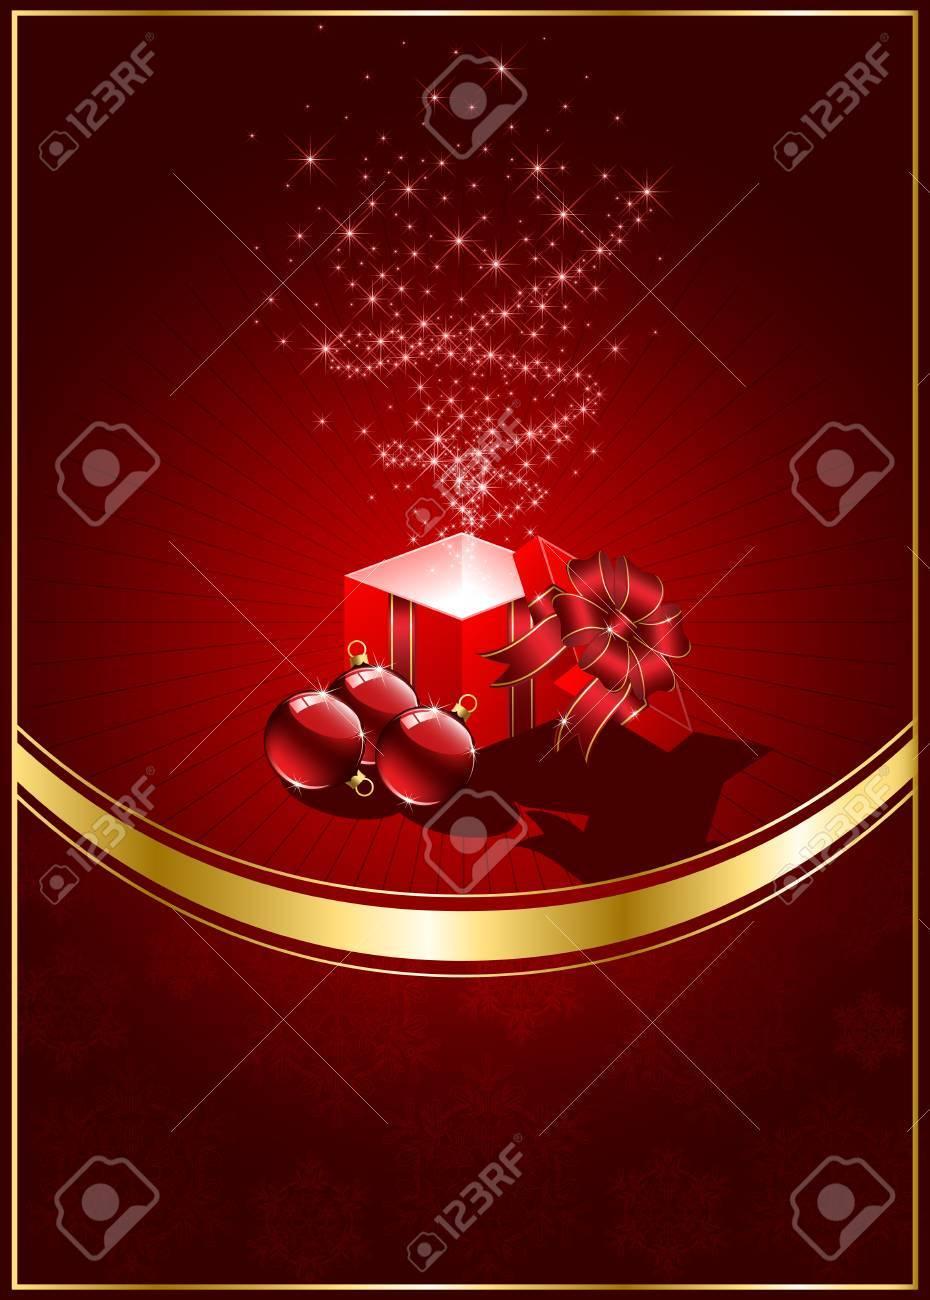 Open magic Gift box and Christmas balls, illustration Stock Vector - 8345951